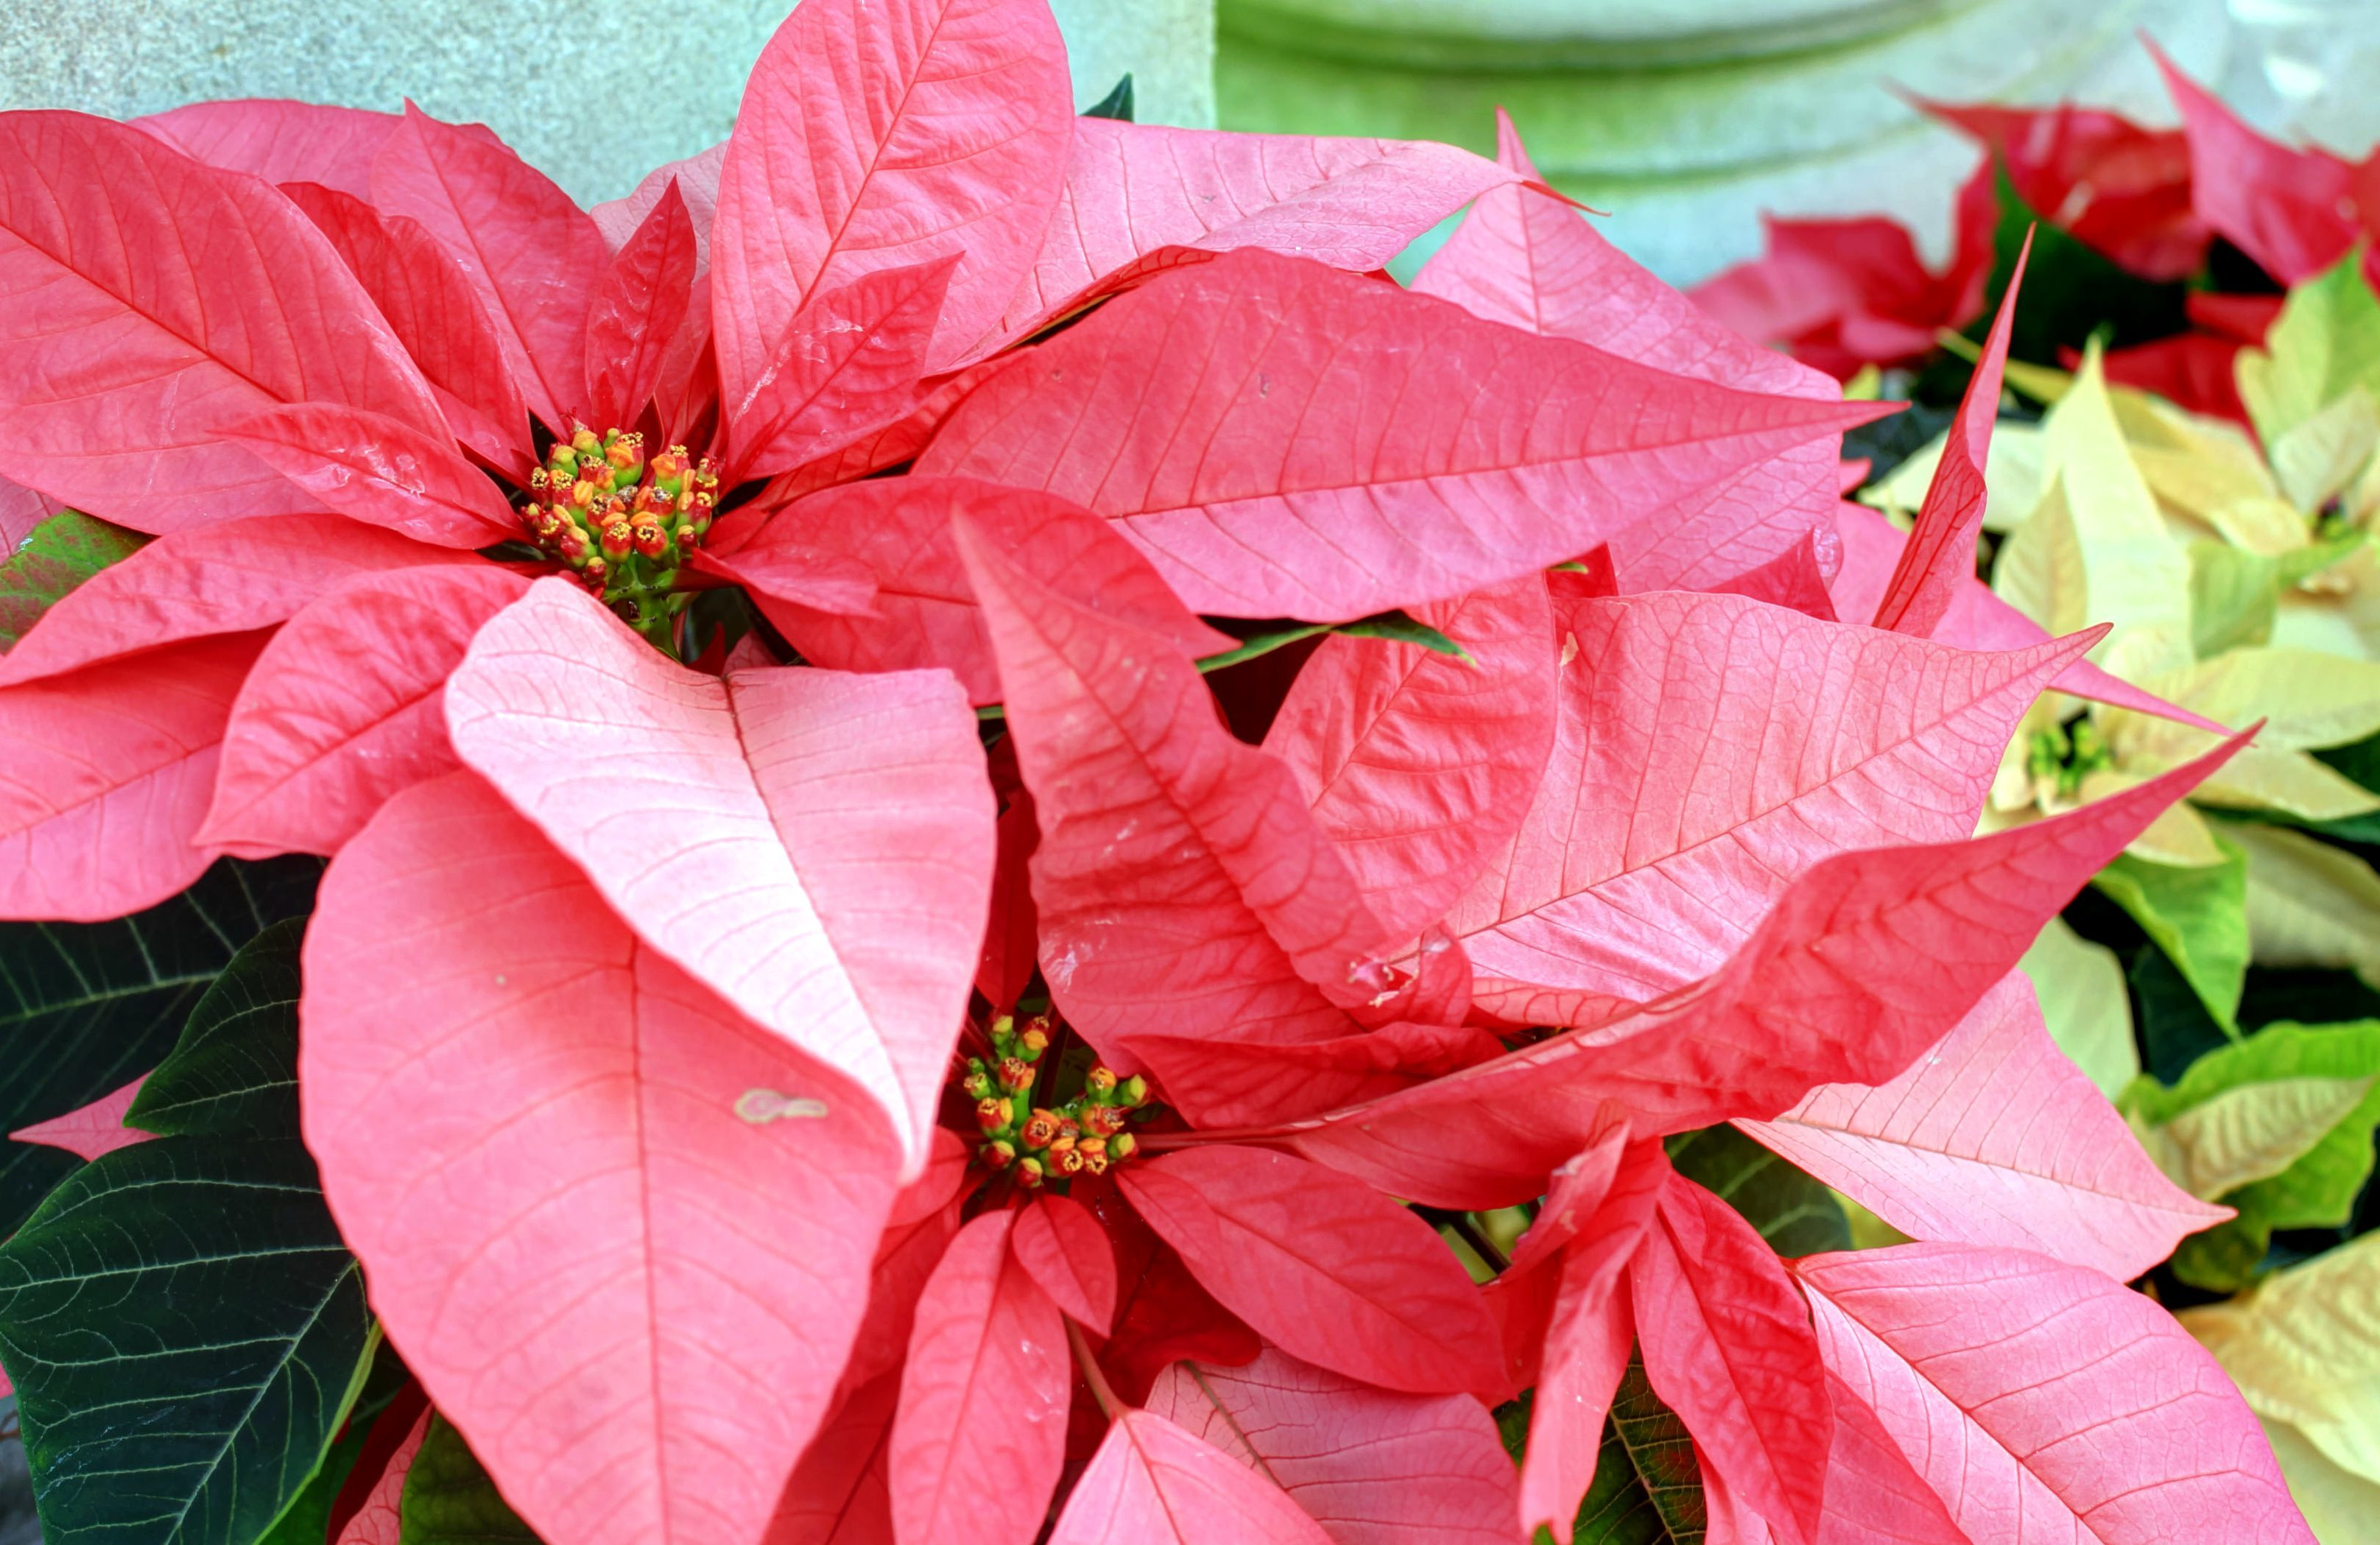 Foto gratis: pianta poinsettia, grandi foglie rosse